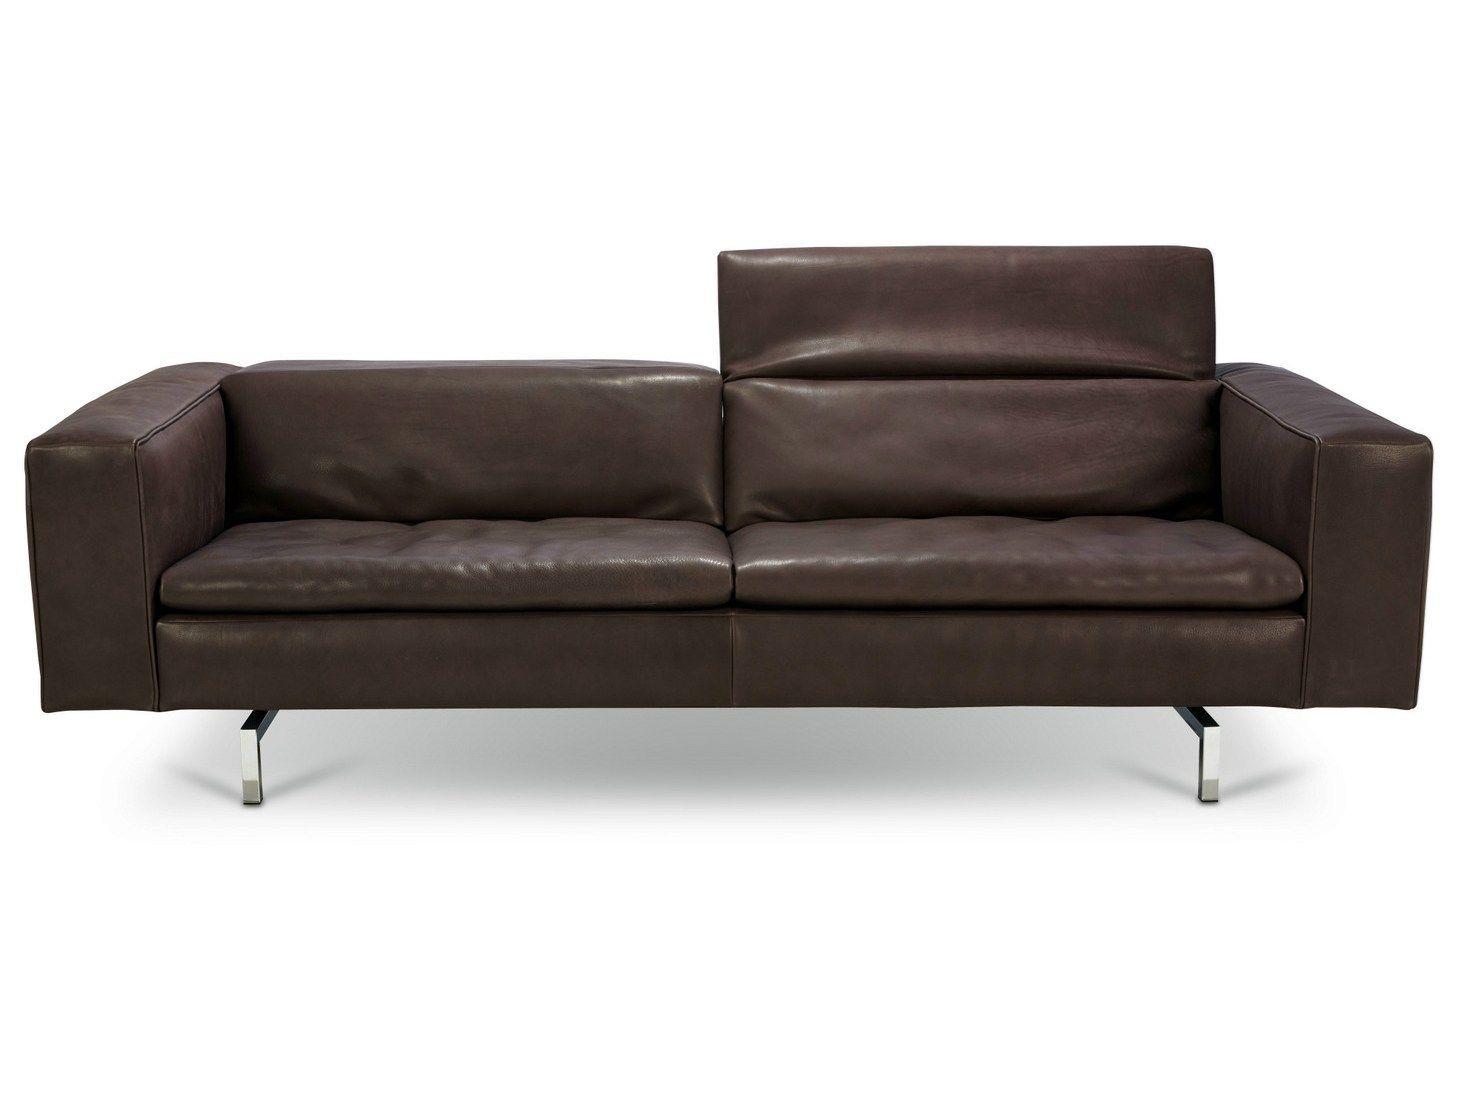 shiva sofa with headrest shiva collection by jori design jean pierre audebert. Black Bedroom Furniture Sets. Home Design Ideas